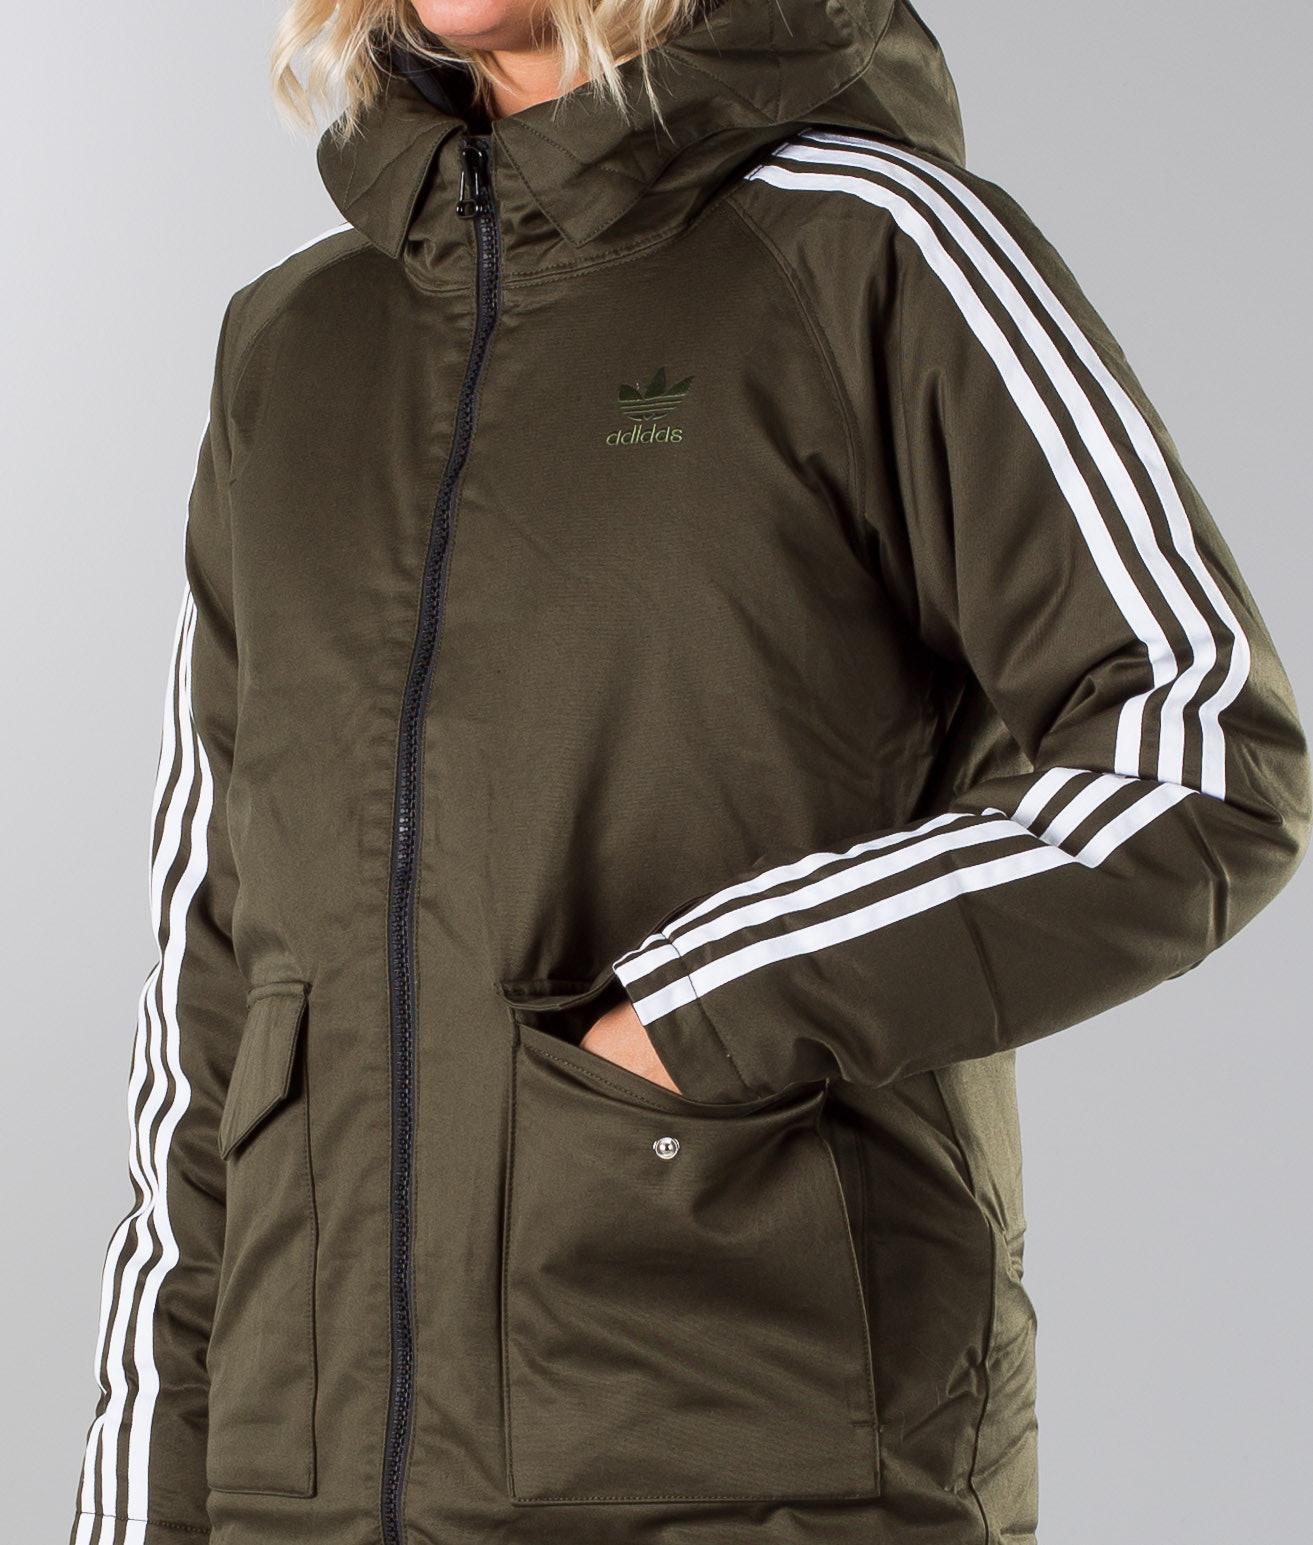 6cf5ce02 Adidas Originals Down Parka Jakke Night Cargo - Ridestore.no